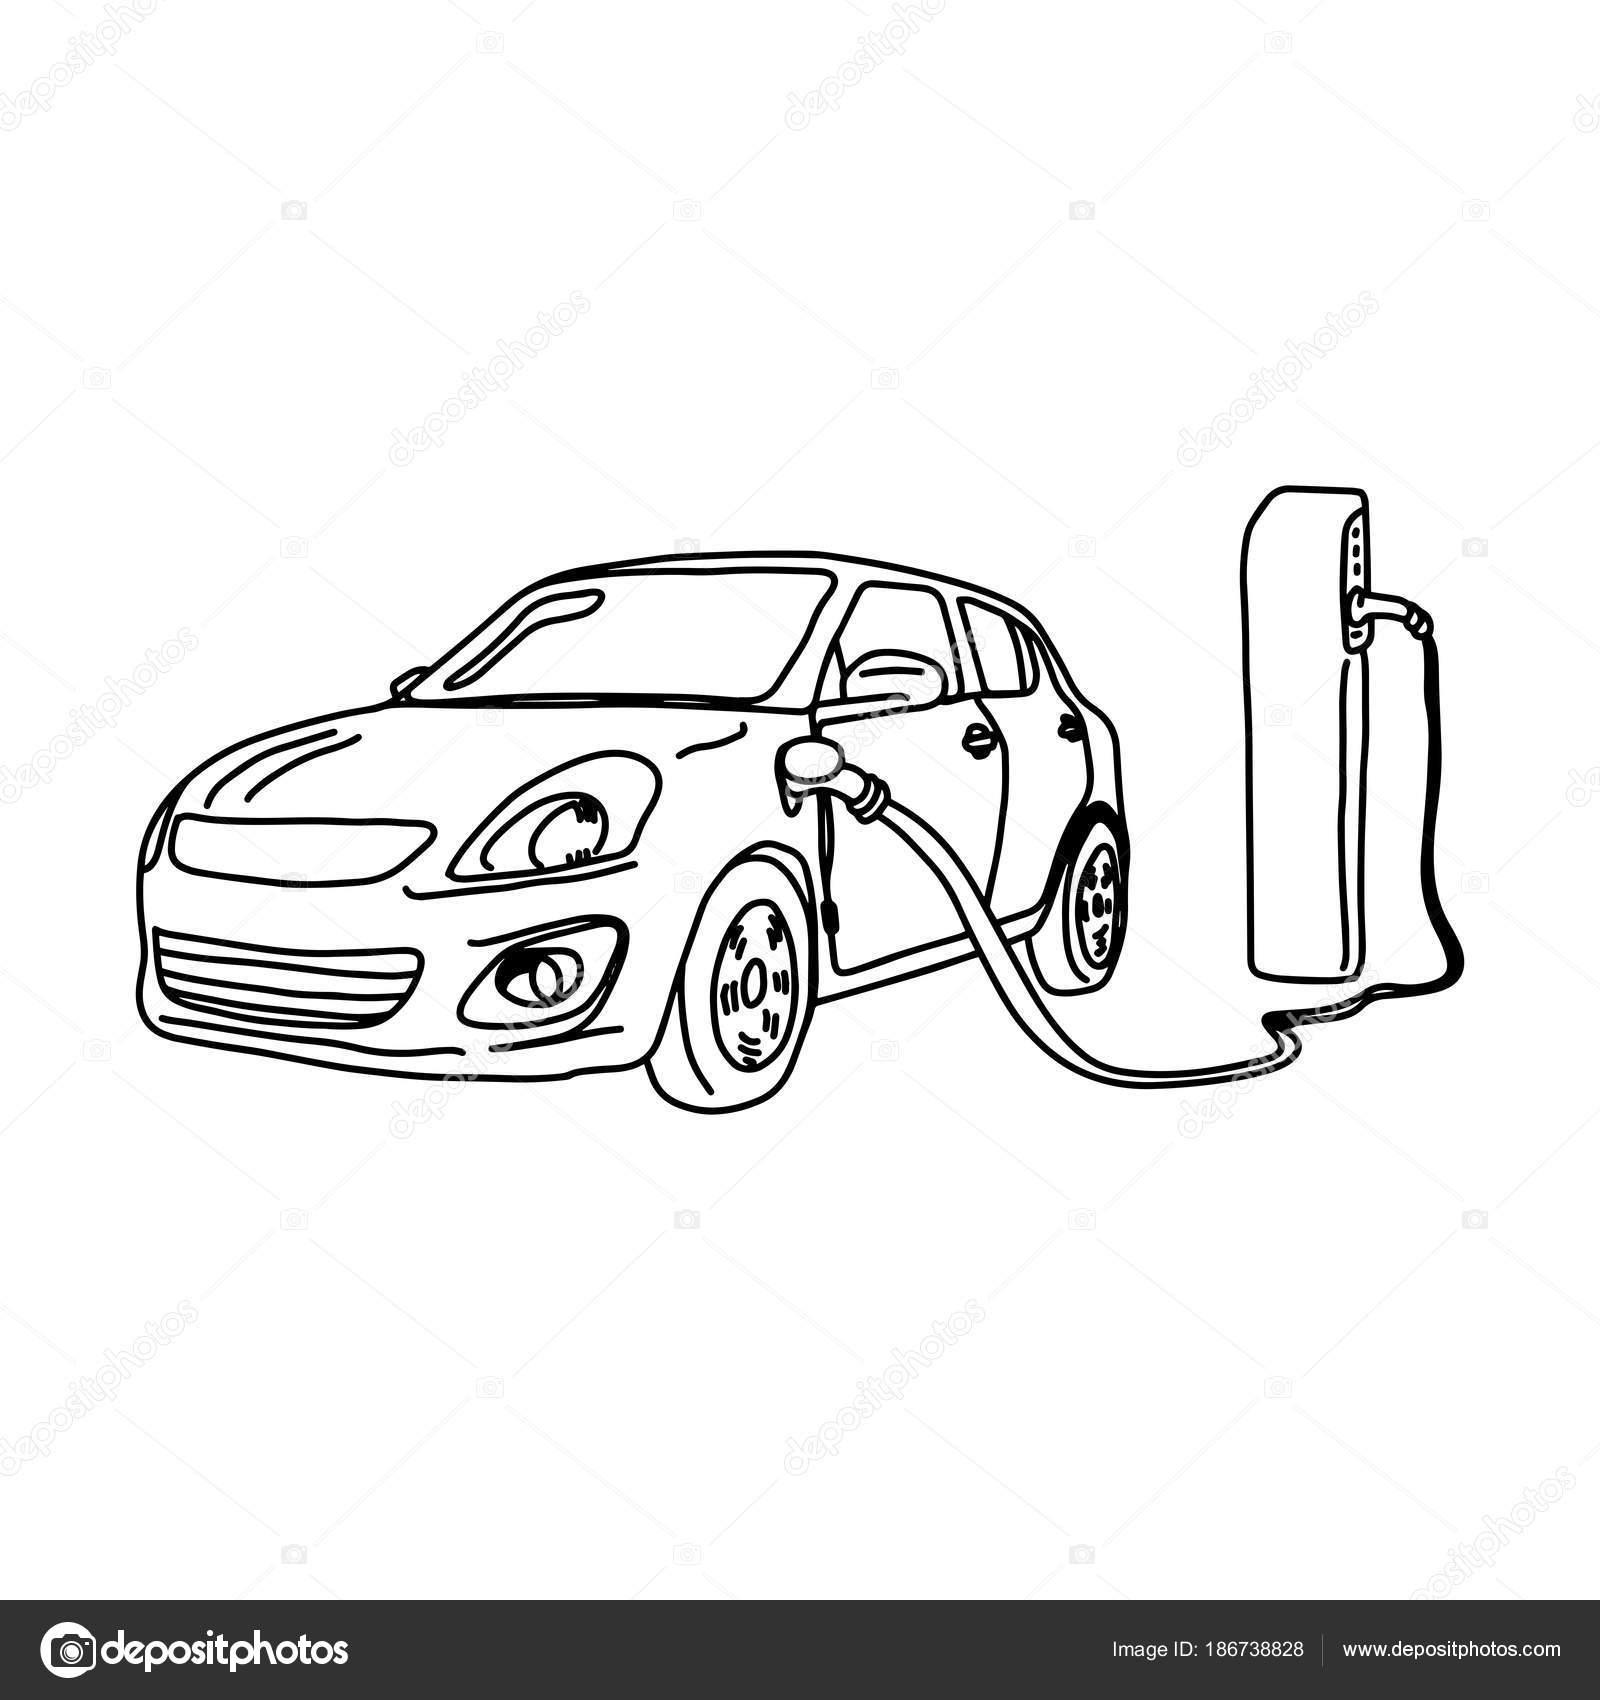 Carro Eletrico E Ilustracao Vetorial De Estacao De